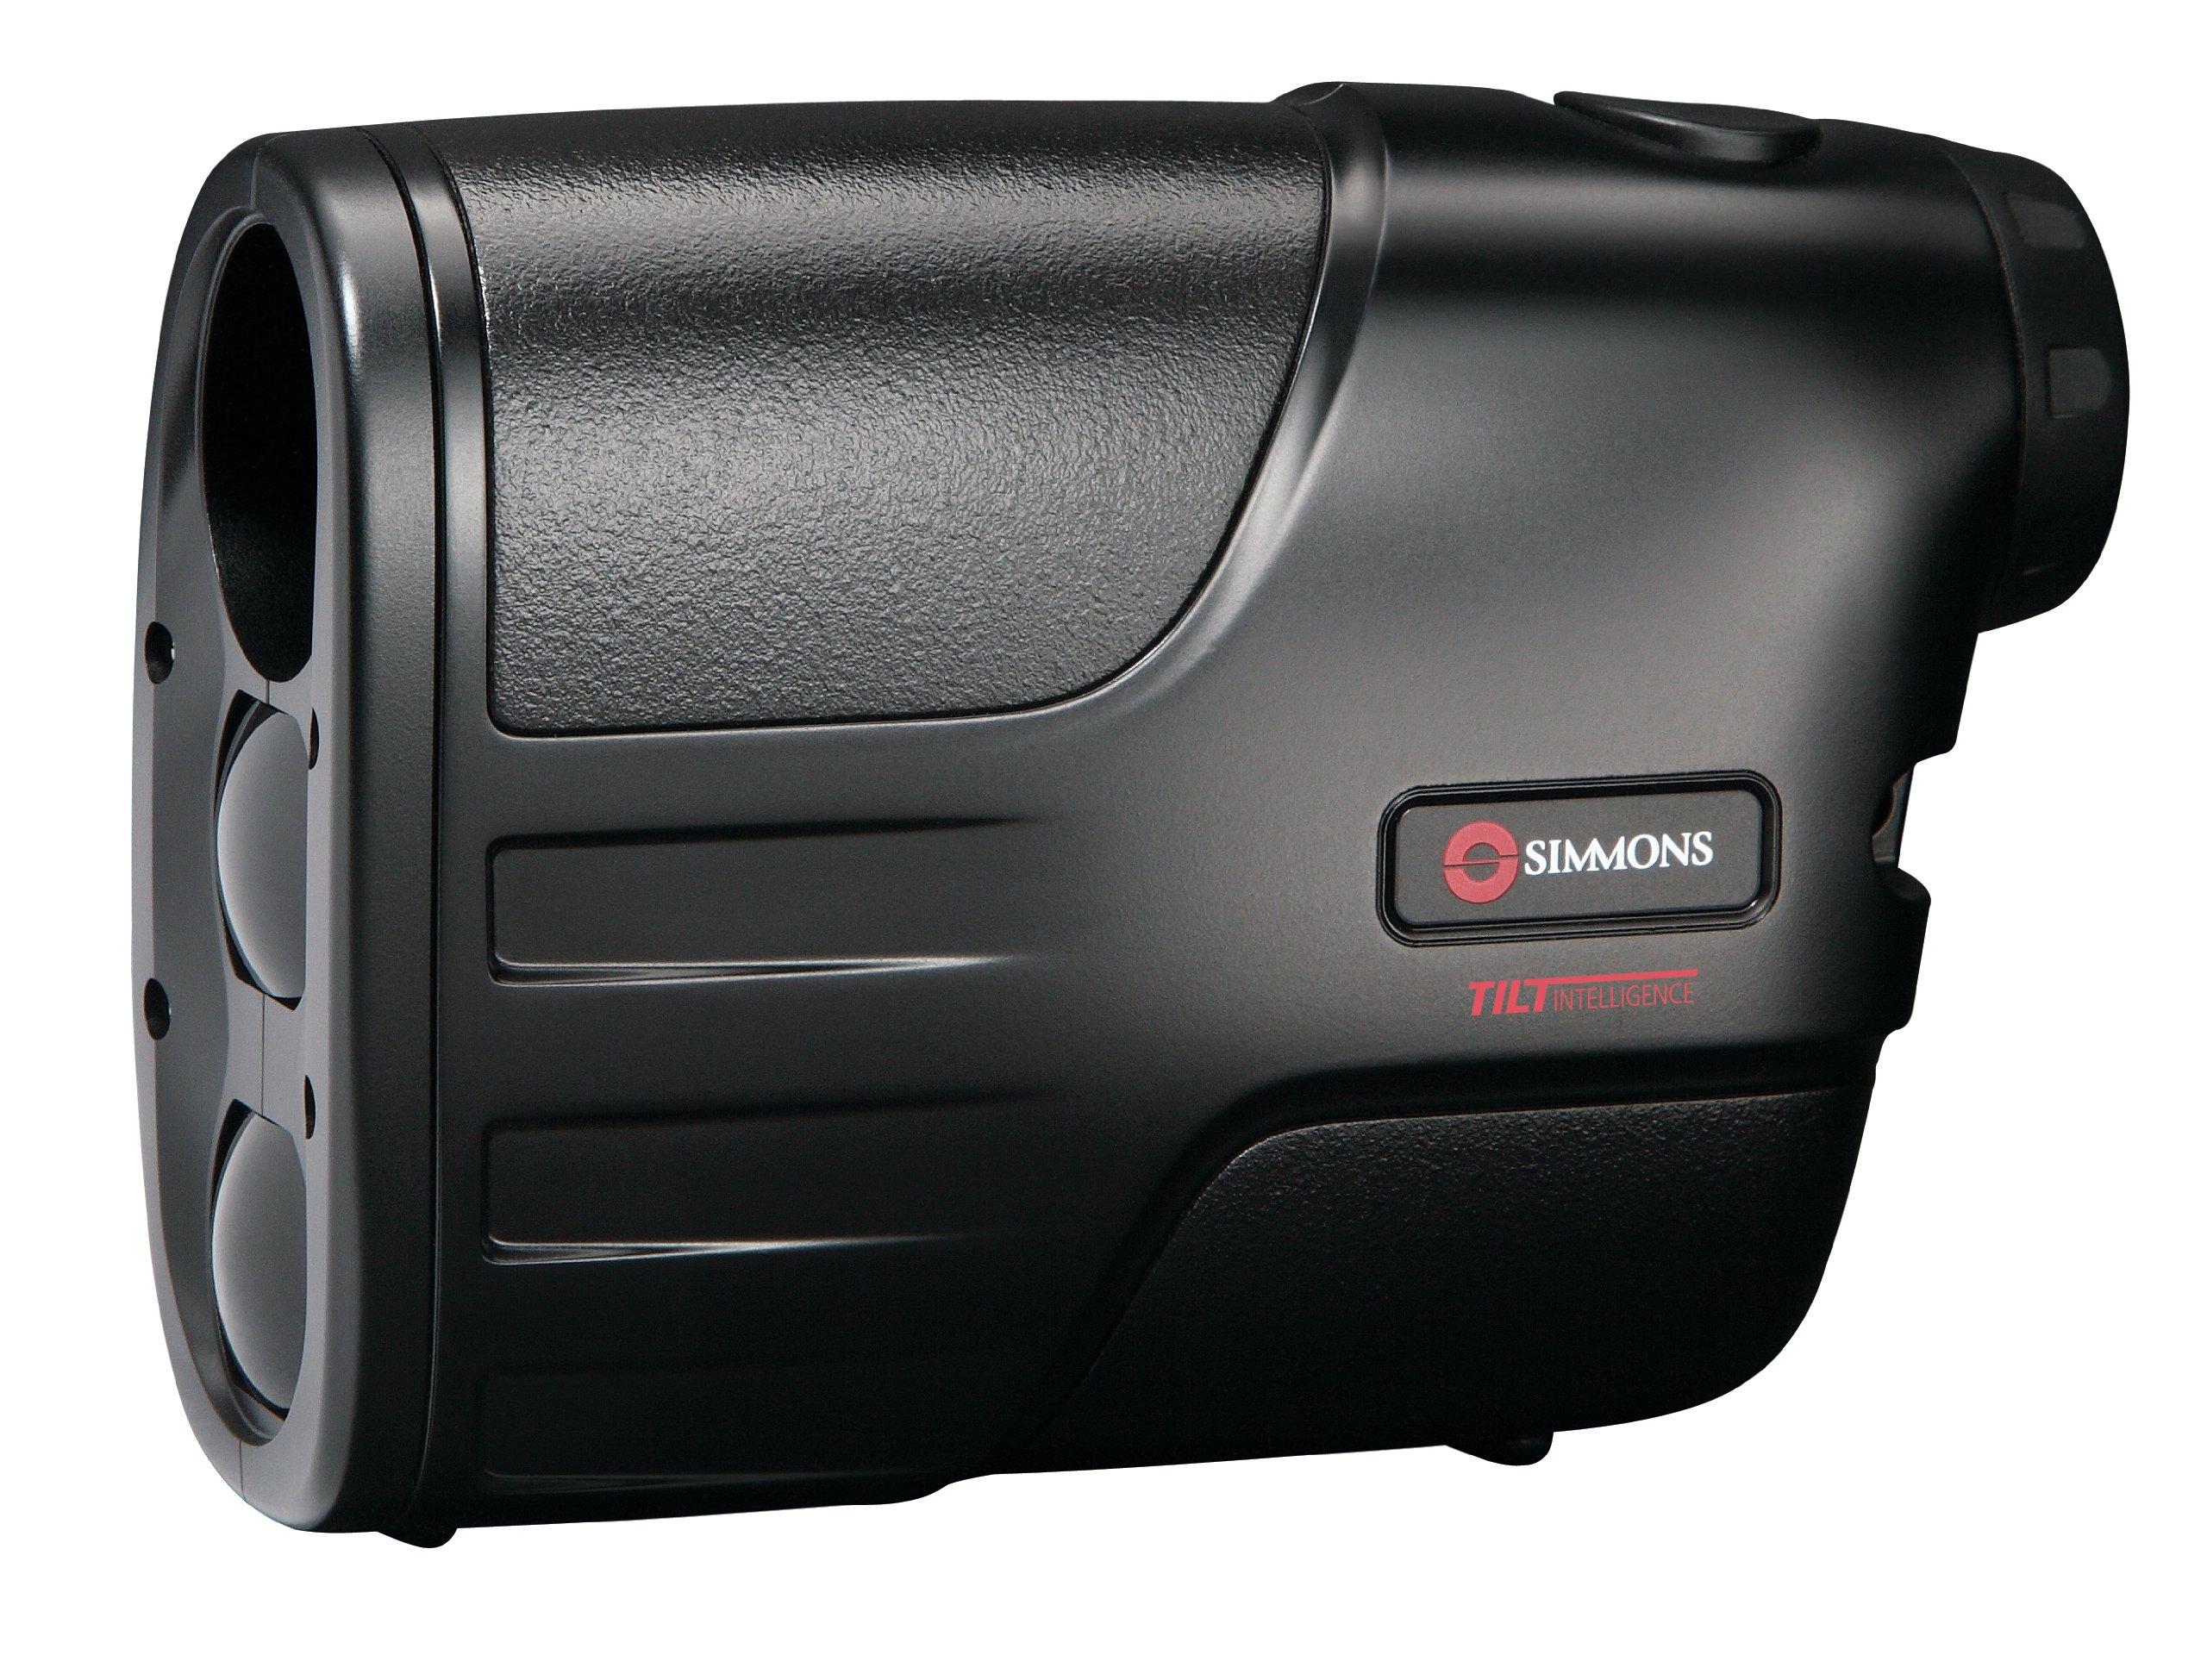 Simmons LRF 600 Tilt Intelligence Laser Rangefinder by Simmons